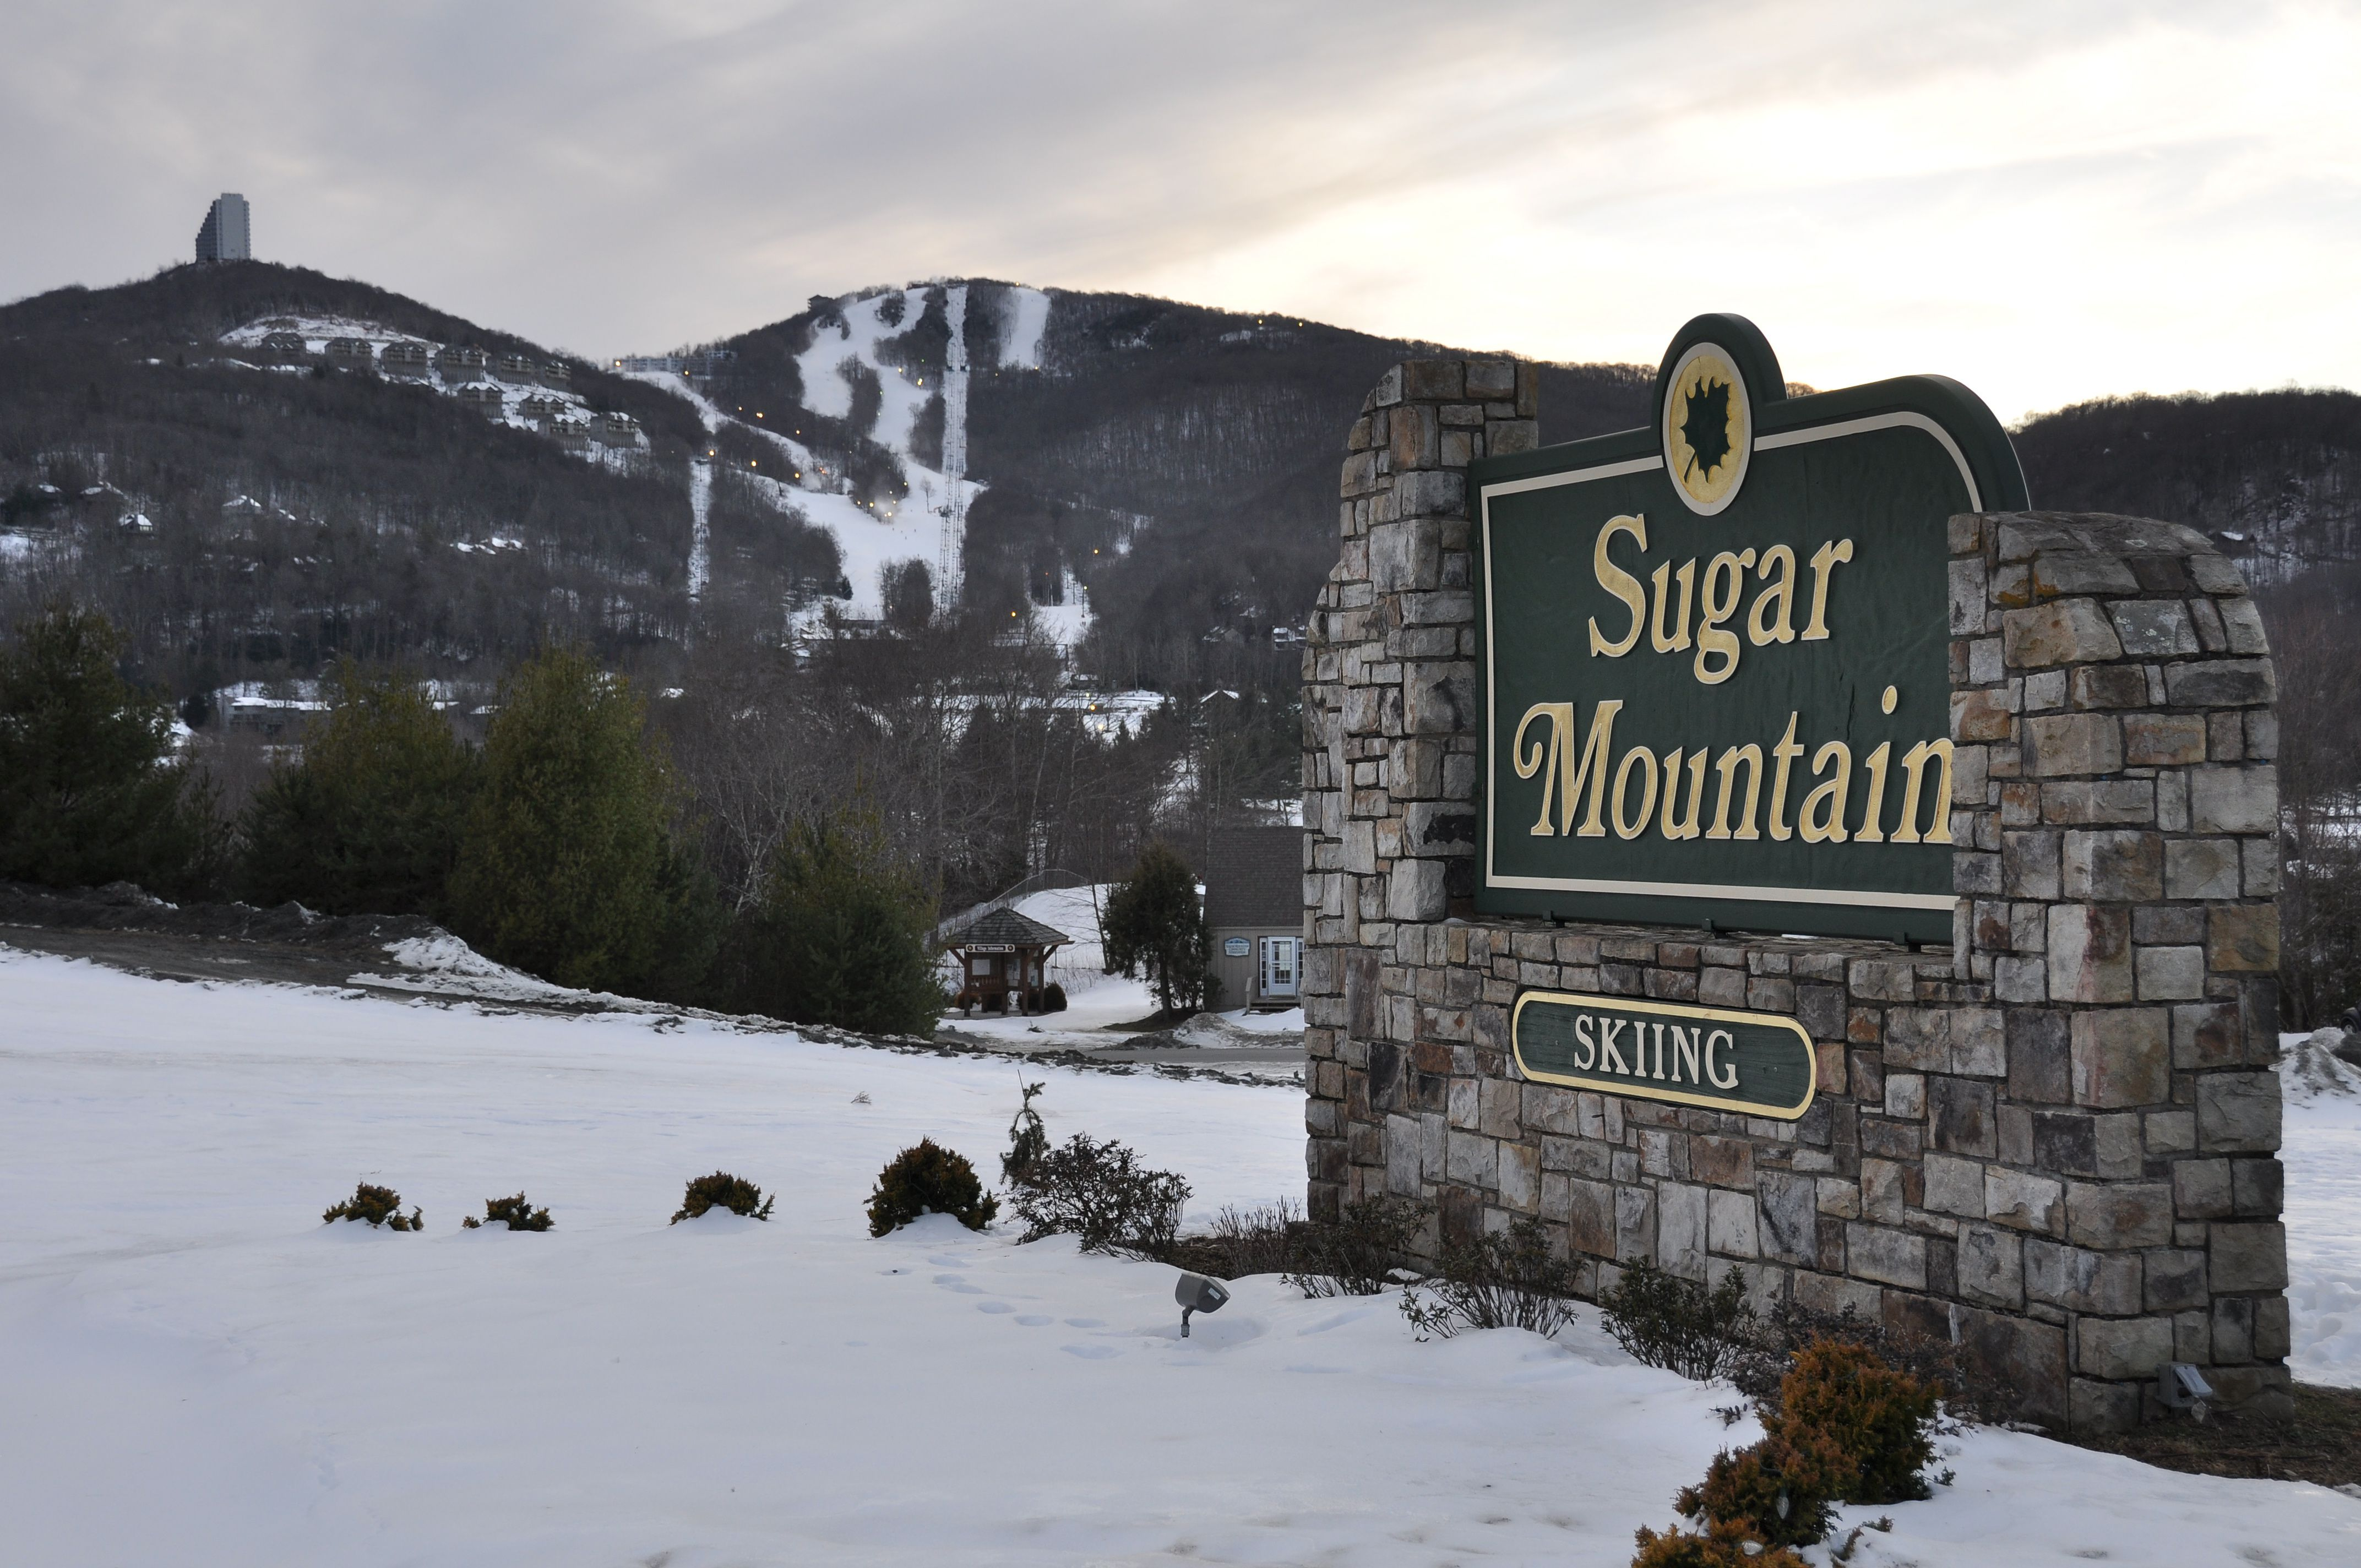 Entrance sign for Sugar Mountain, North Carolina